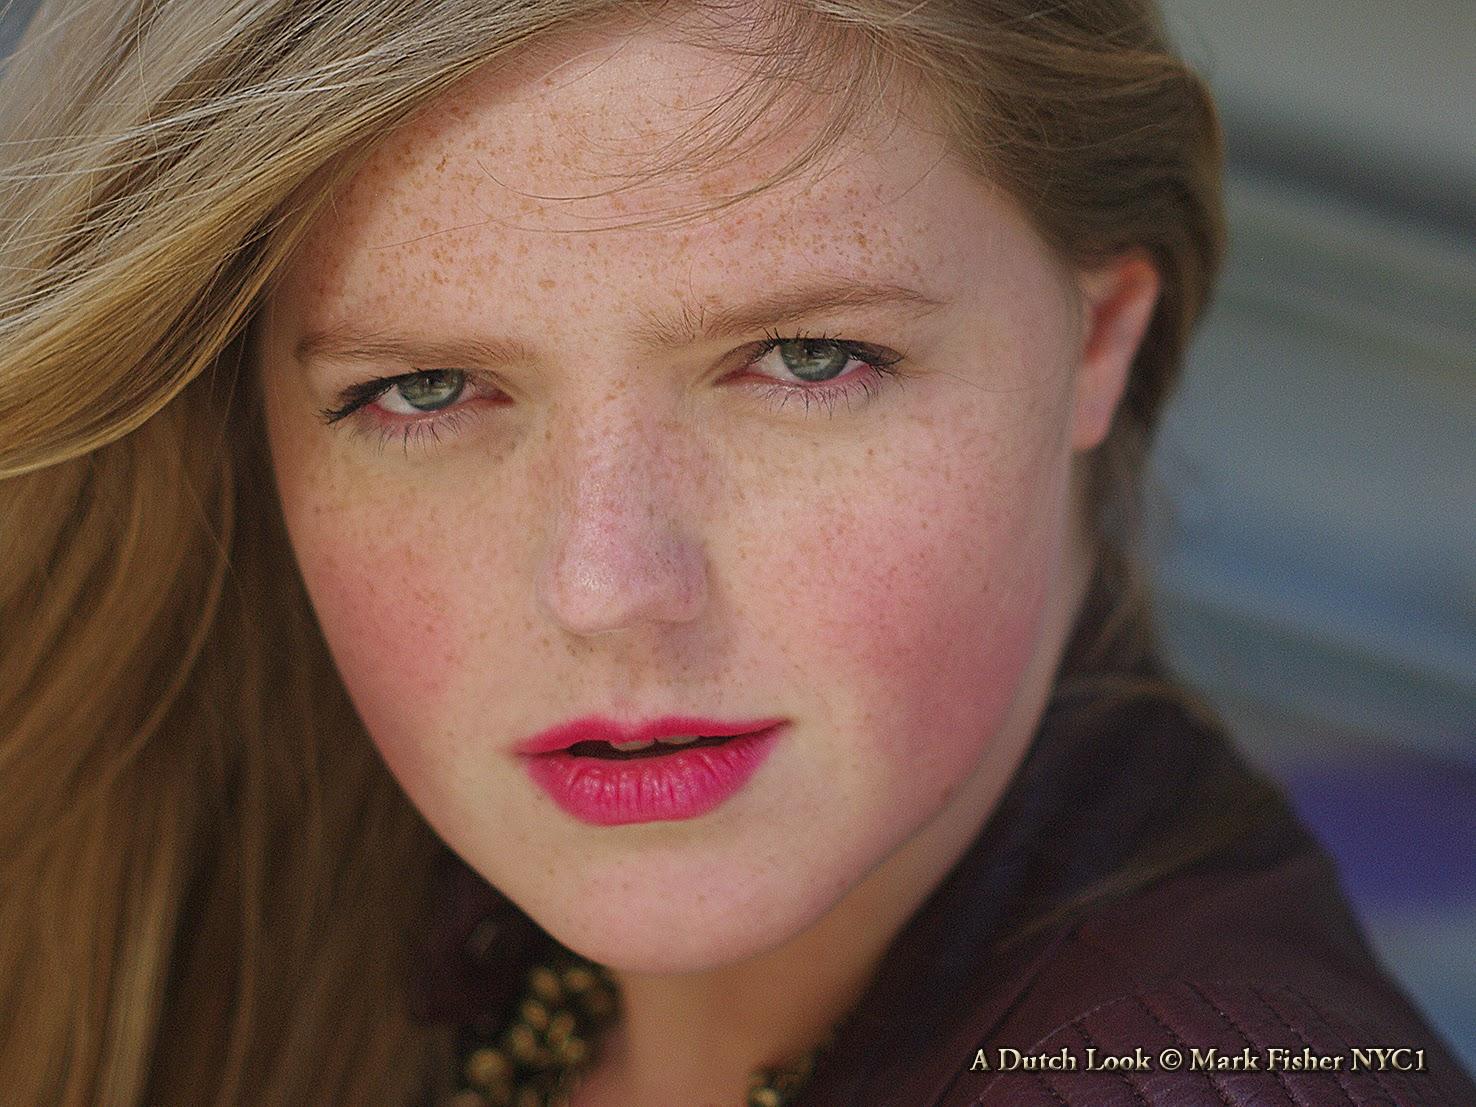 Malou: Mark Fisher American Photographer™: A Dutch Look